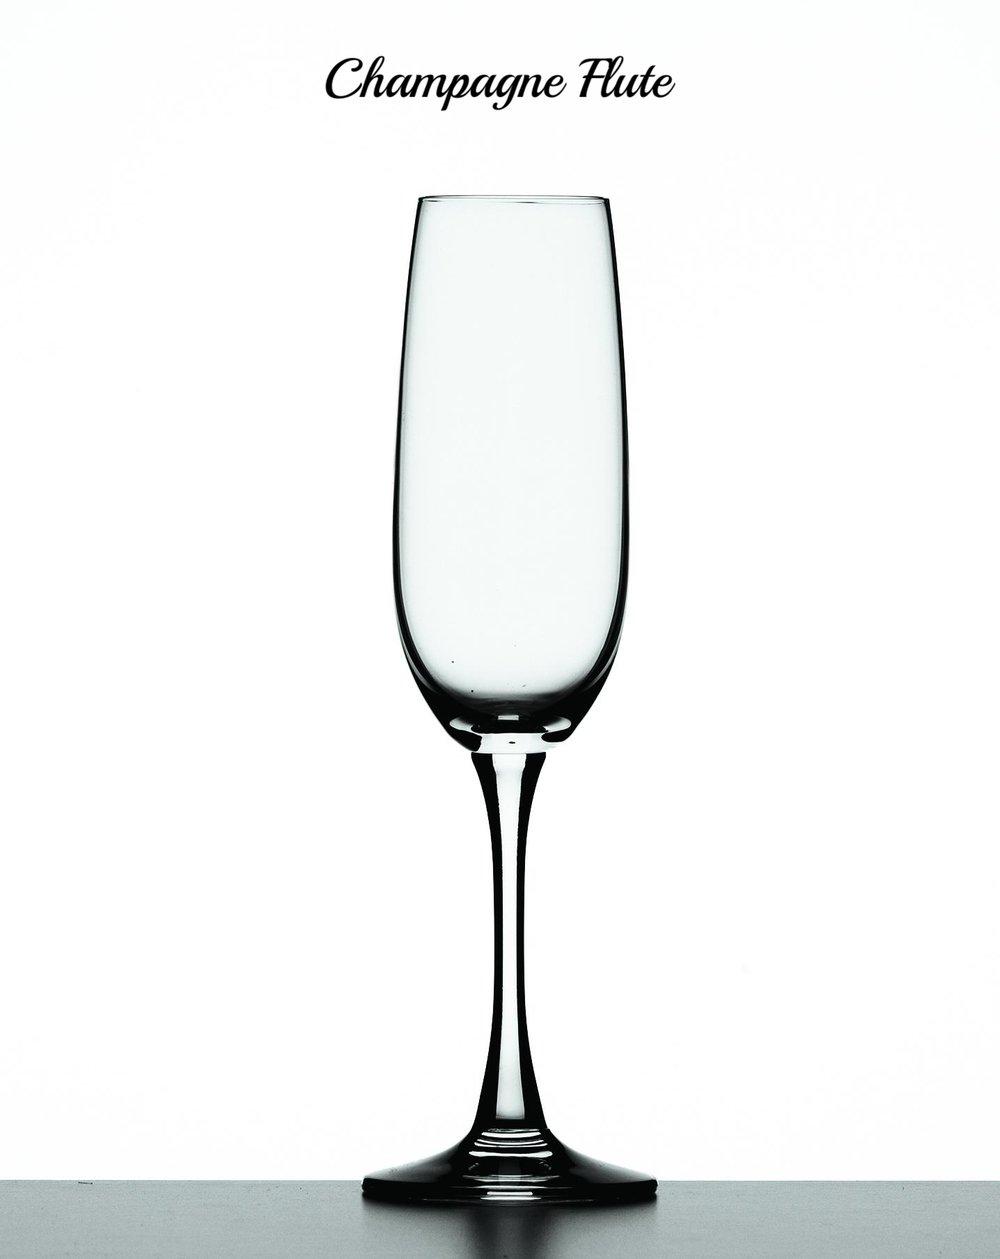 Soiree Champagne Flute 4078007.jpg